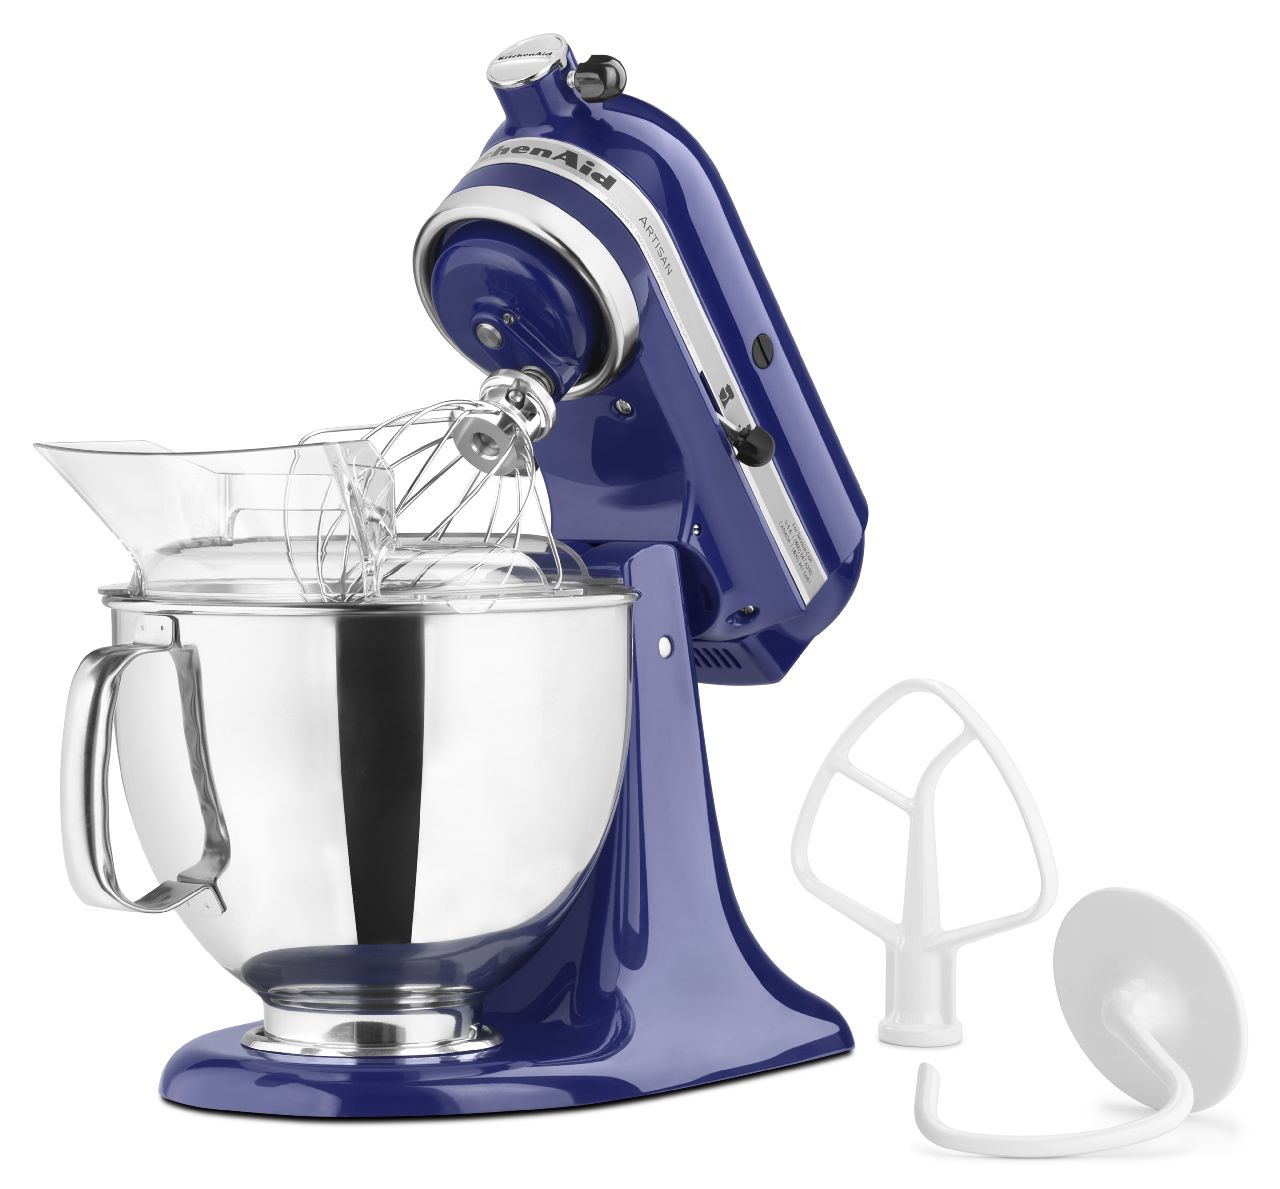 KitchenAid KSM150PSB Artisan® Series 5 Quart. Stand Mixer - Cobalt Blue